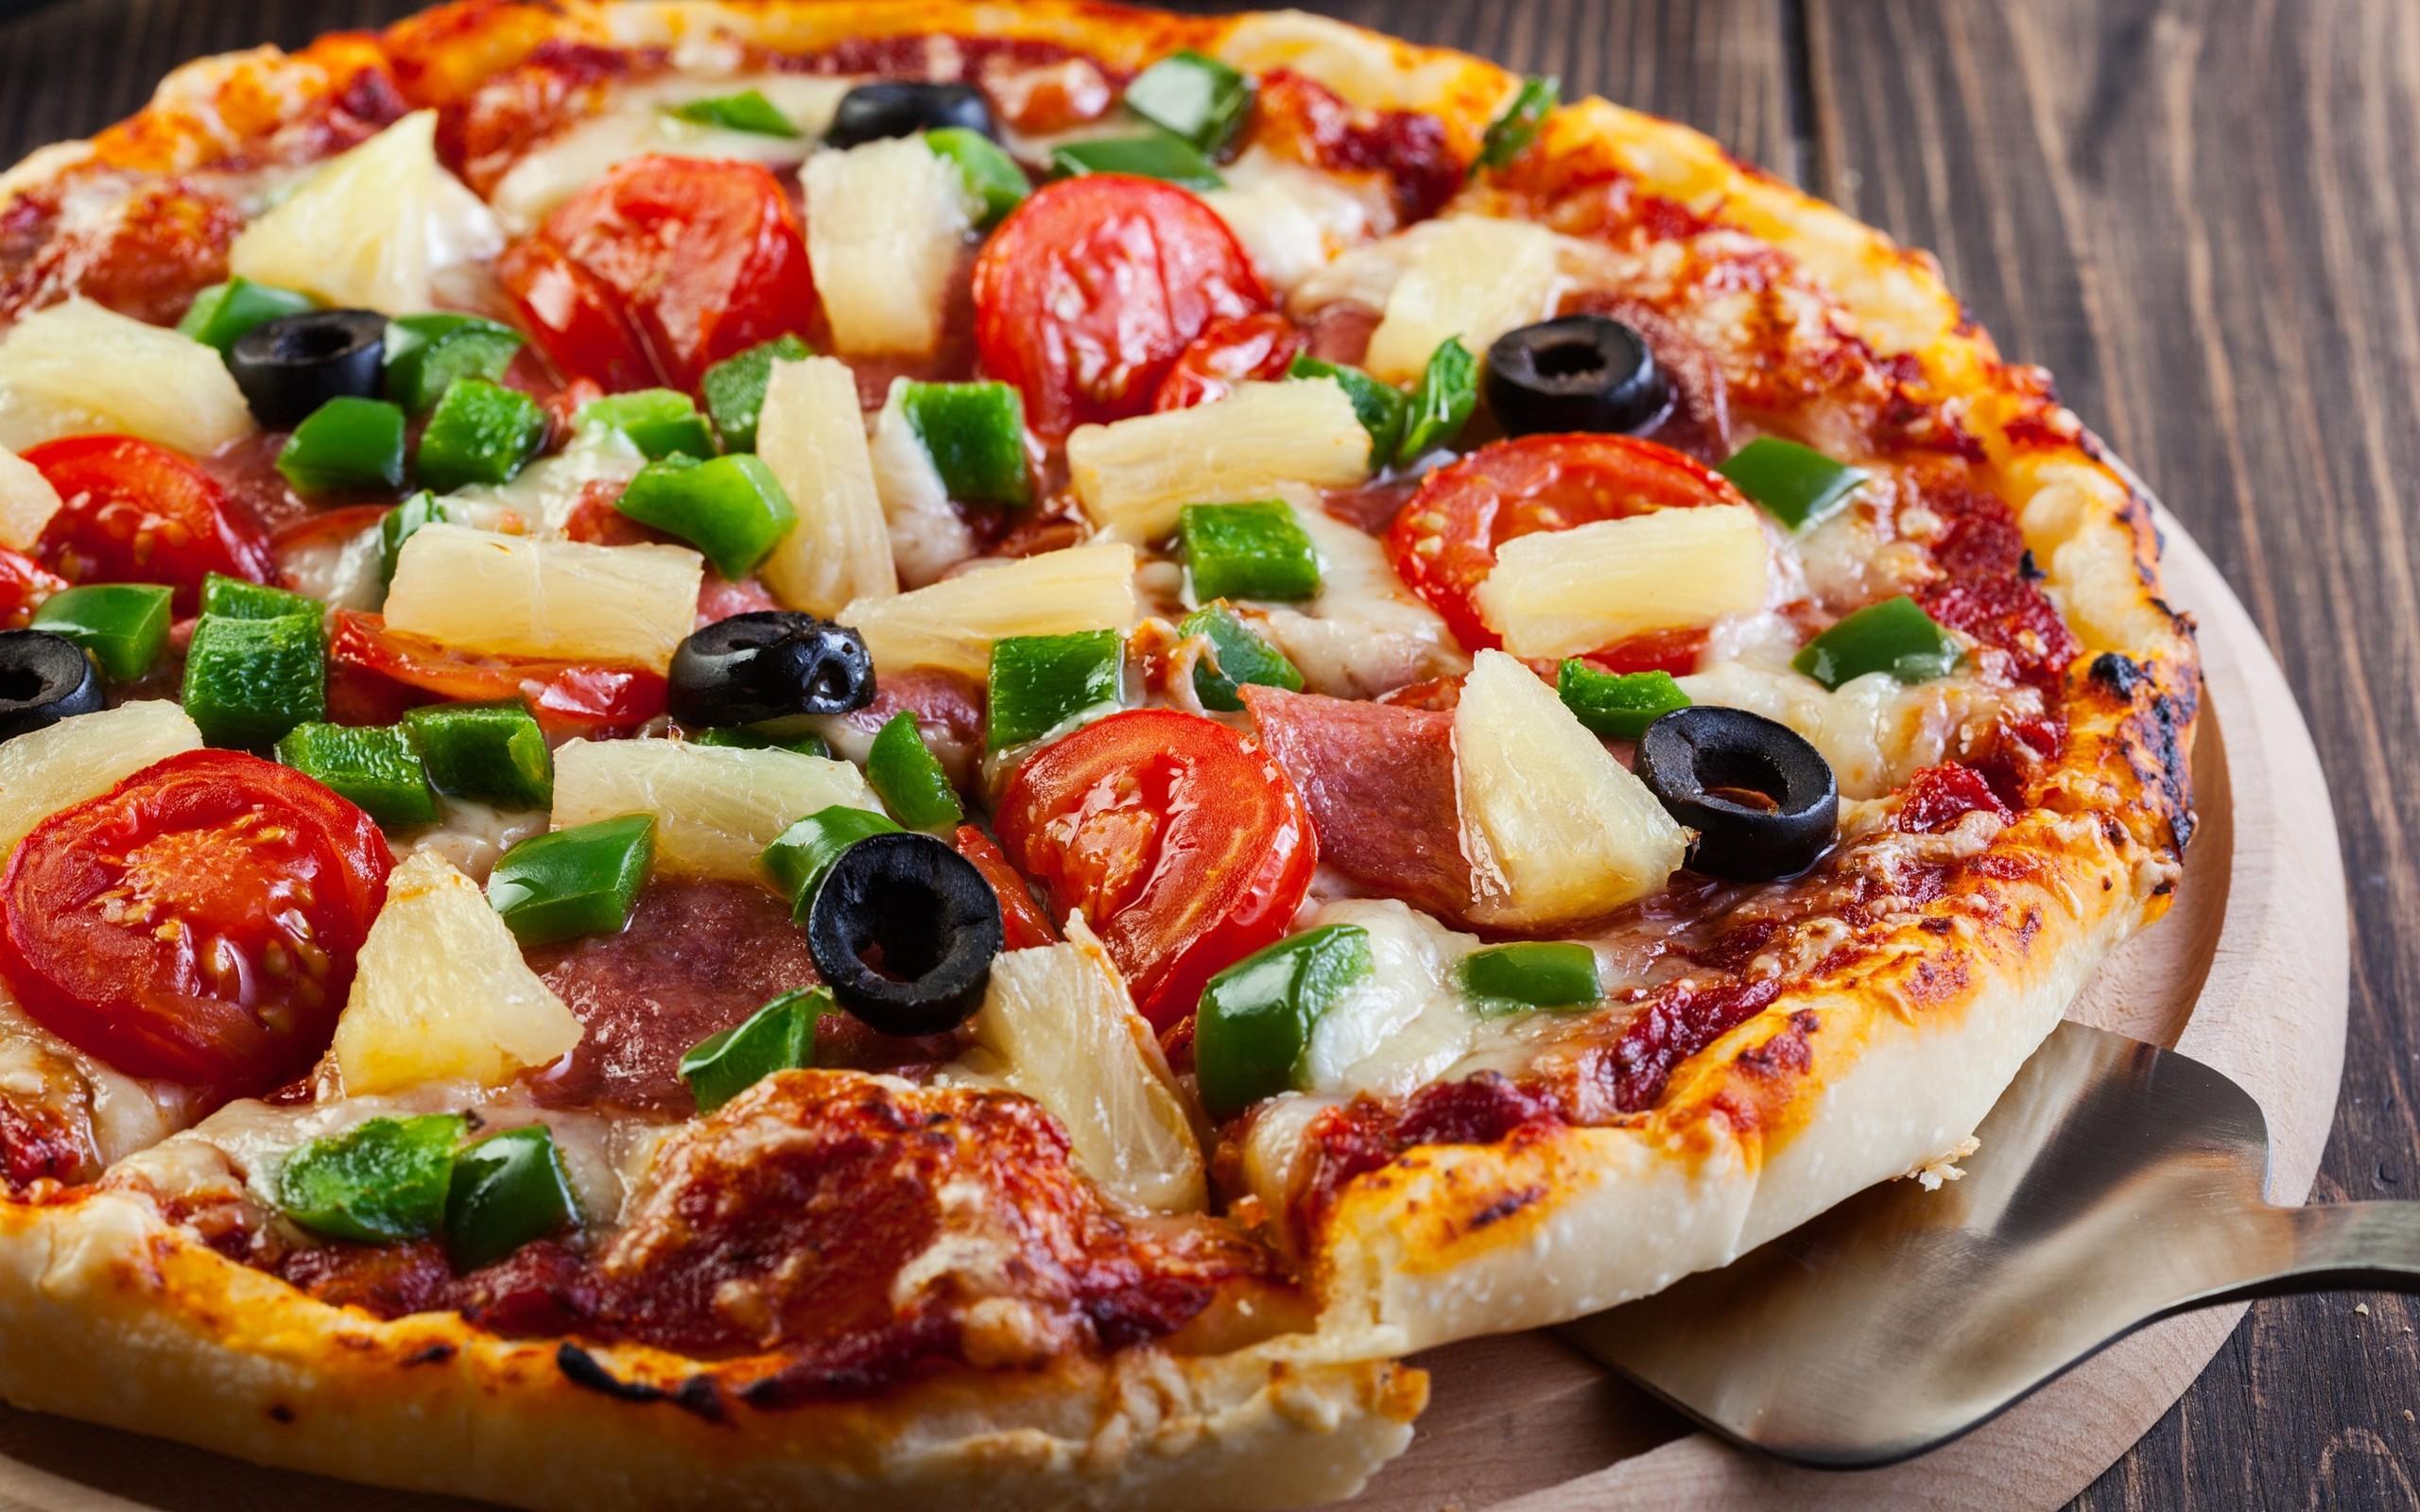 food tomatoes pizza pineapples olives cuisine dish produce italian food european food pizza cheese sicilian pizza